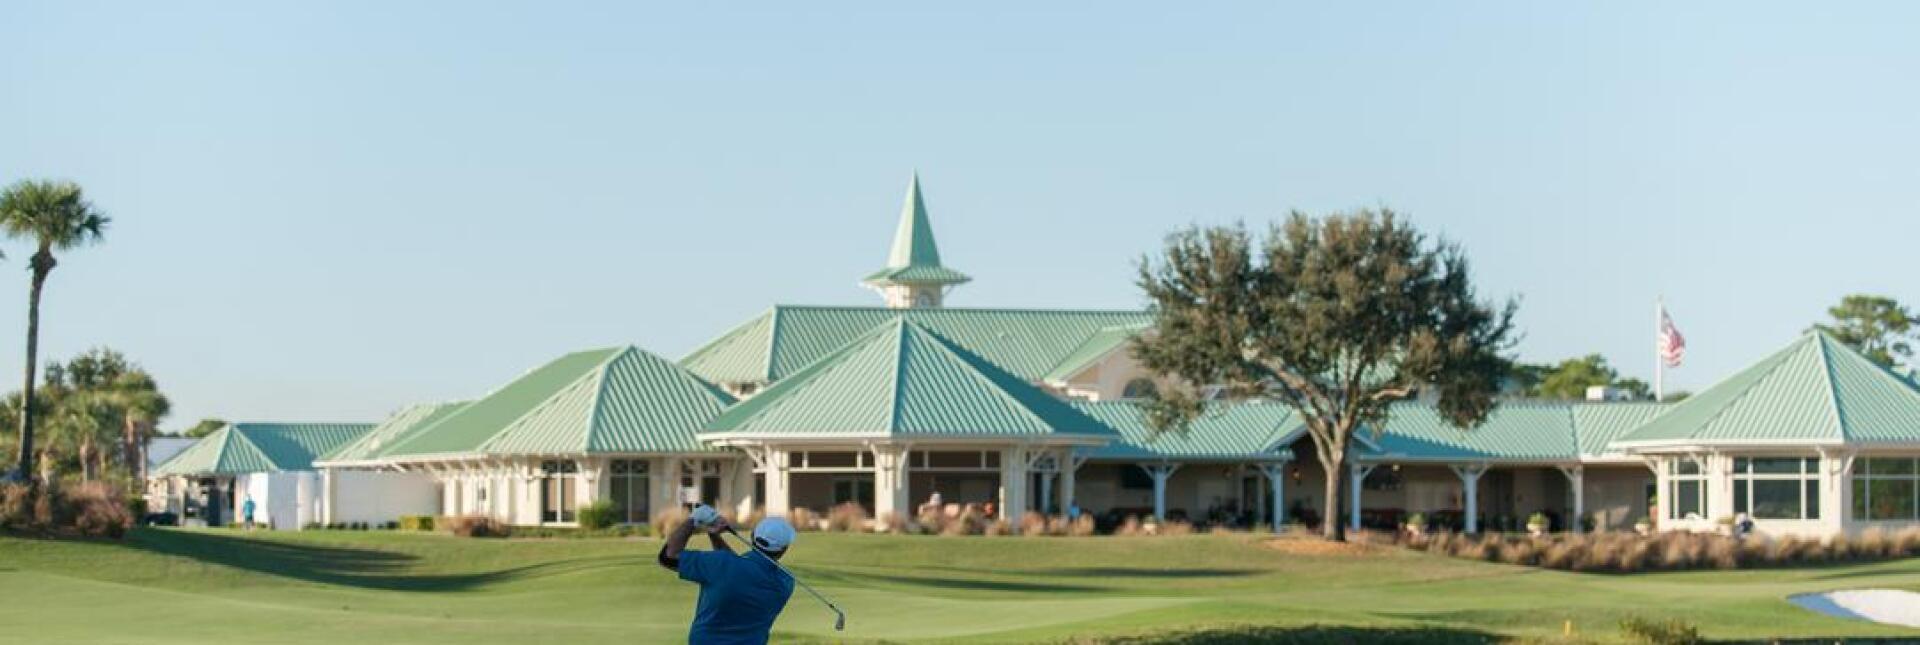 PGA Golf Club - Wanamaker Course